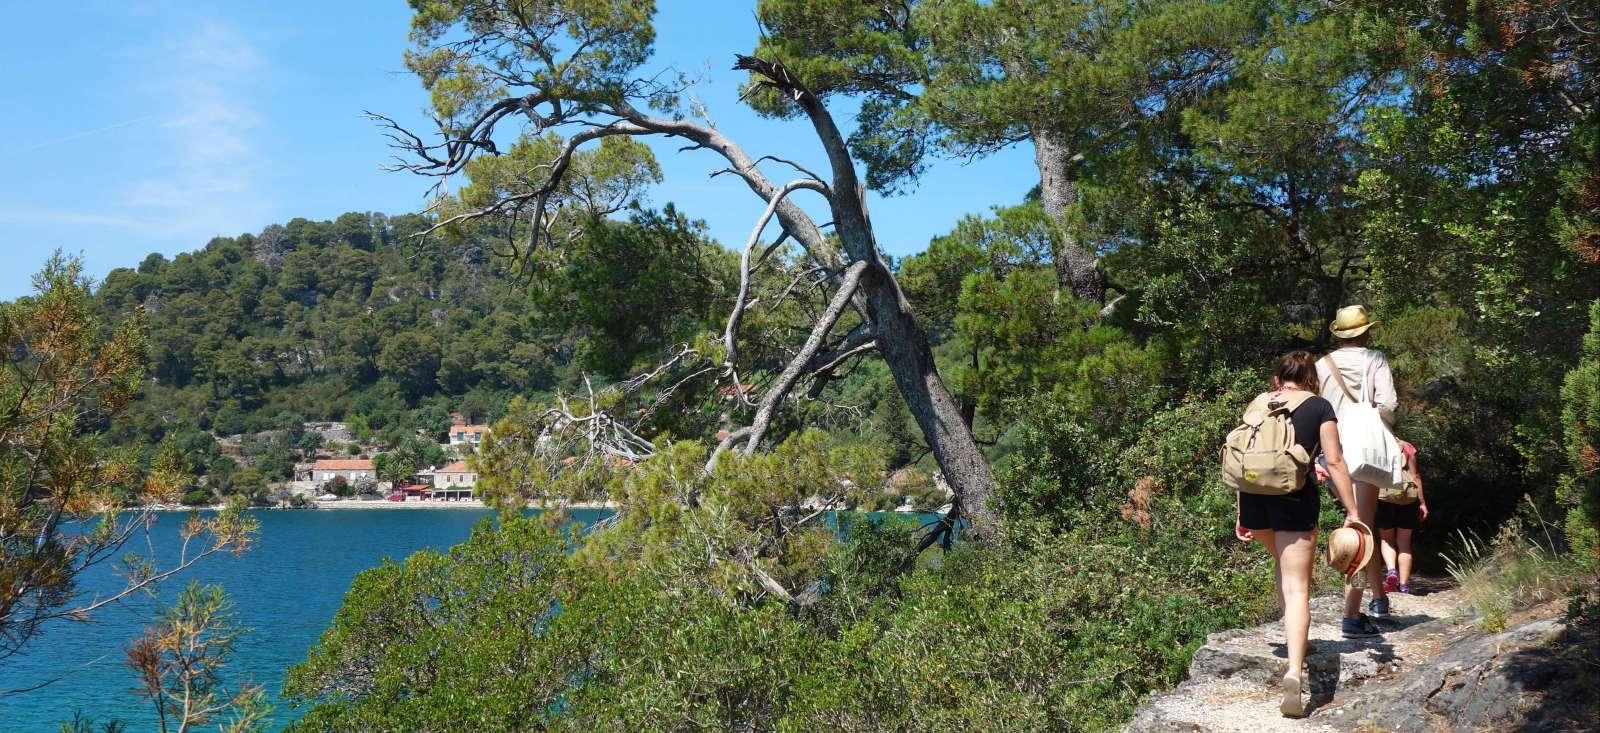 Voyage à pied : Mljet, 100% nature